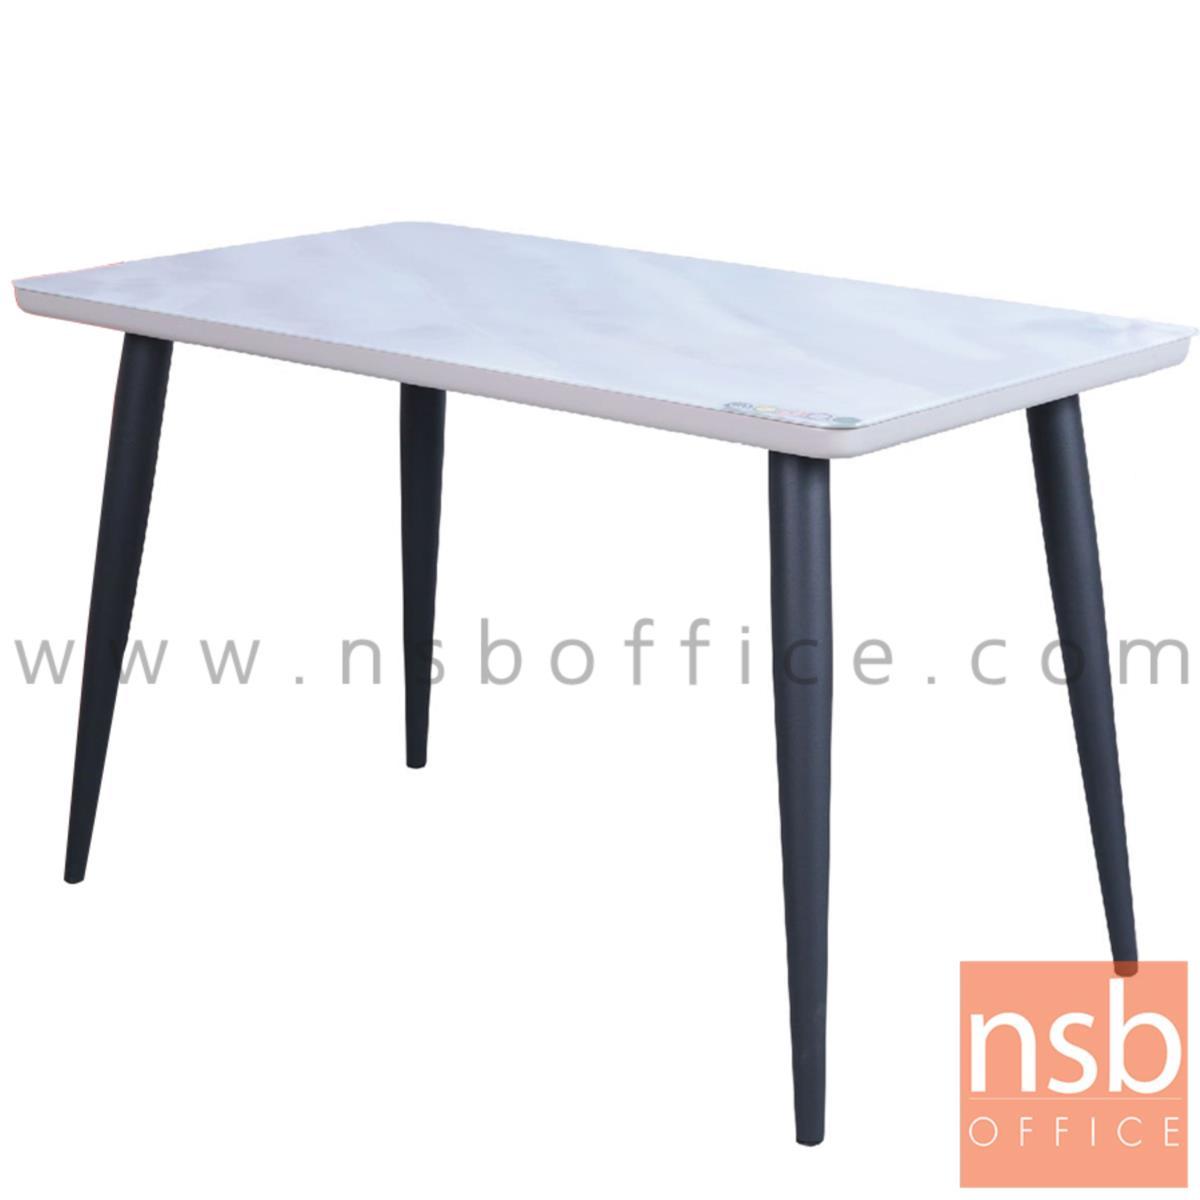 G14A218:โต๊ะรับประทานอาหาร รุ่น Bolza (โบลซา) ขนาด 120W cm. หน้ากระจกลายหินอ่อน ขาเหล็ก